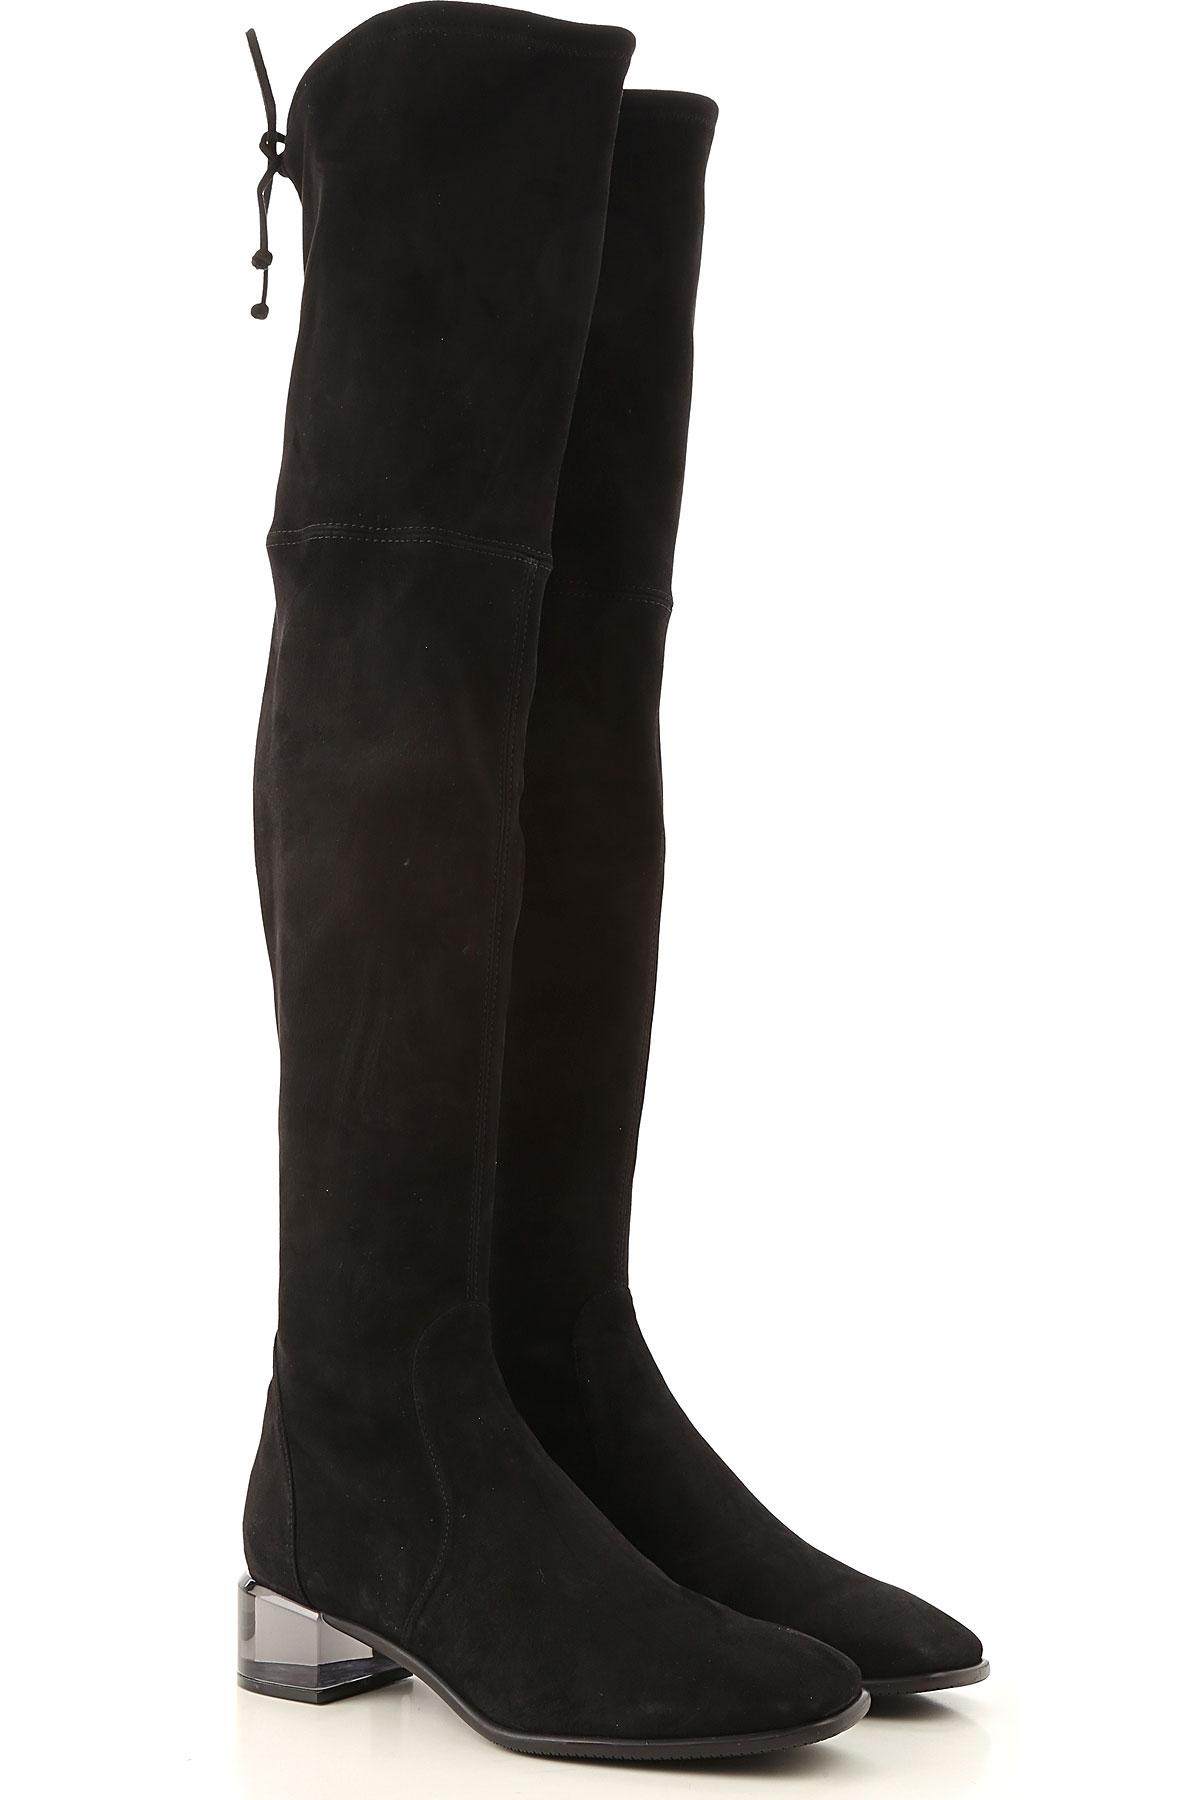 Stuart Weitzman Boots for Women, Booties On Sale, Black, Suede leather, 2019, US 4.5 ( EU 35) US 5 (EU 35.5) US 5.5 (EU 36) US 6 (EU 36.5) US 7 (EU 37